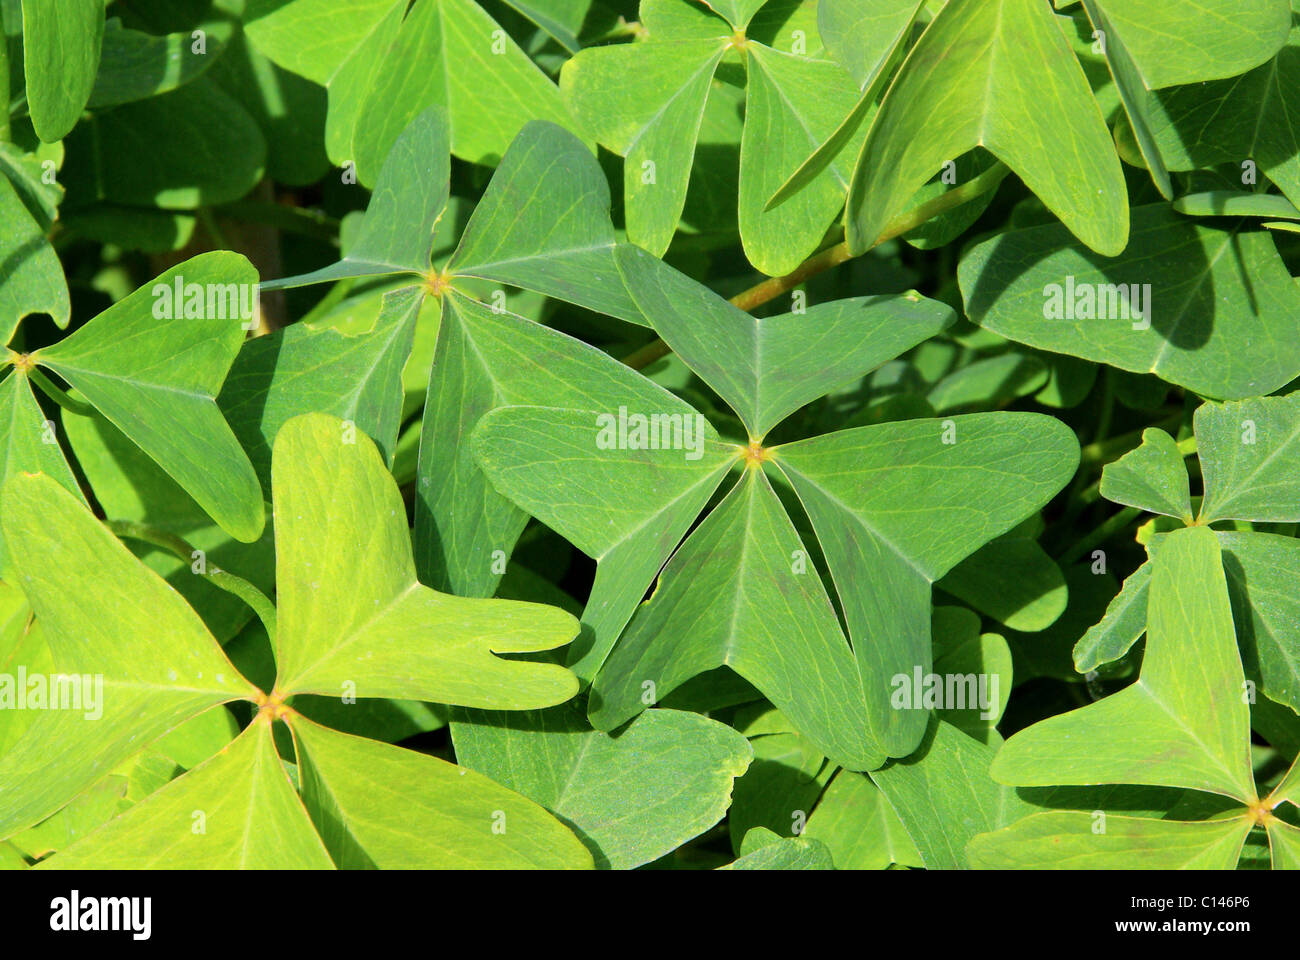 Glücksklee - four leafed clover 17 Stock Photo